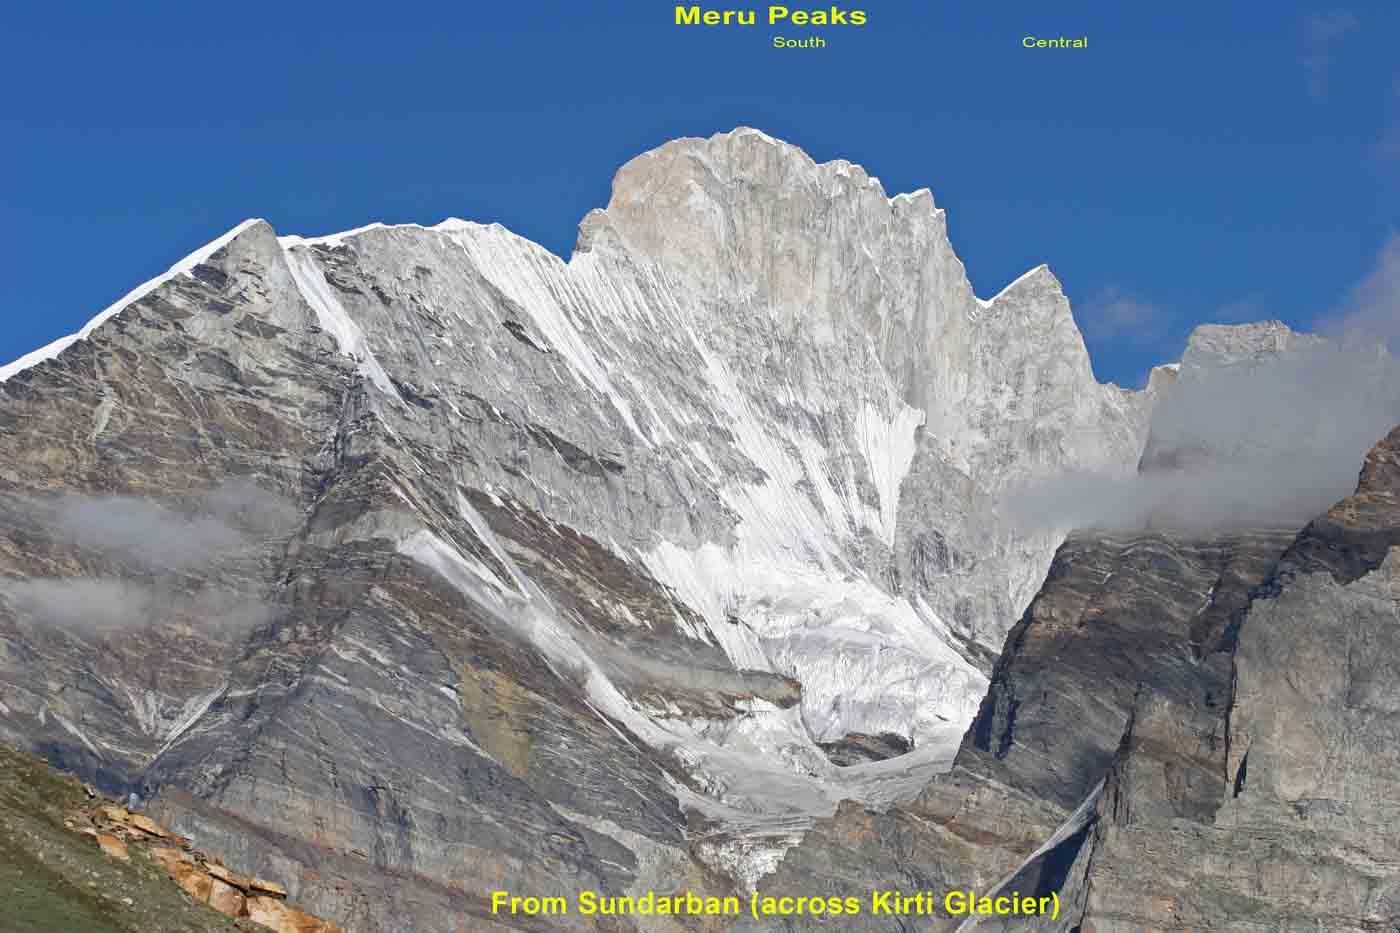 Meru from Kirti Glacier